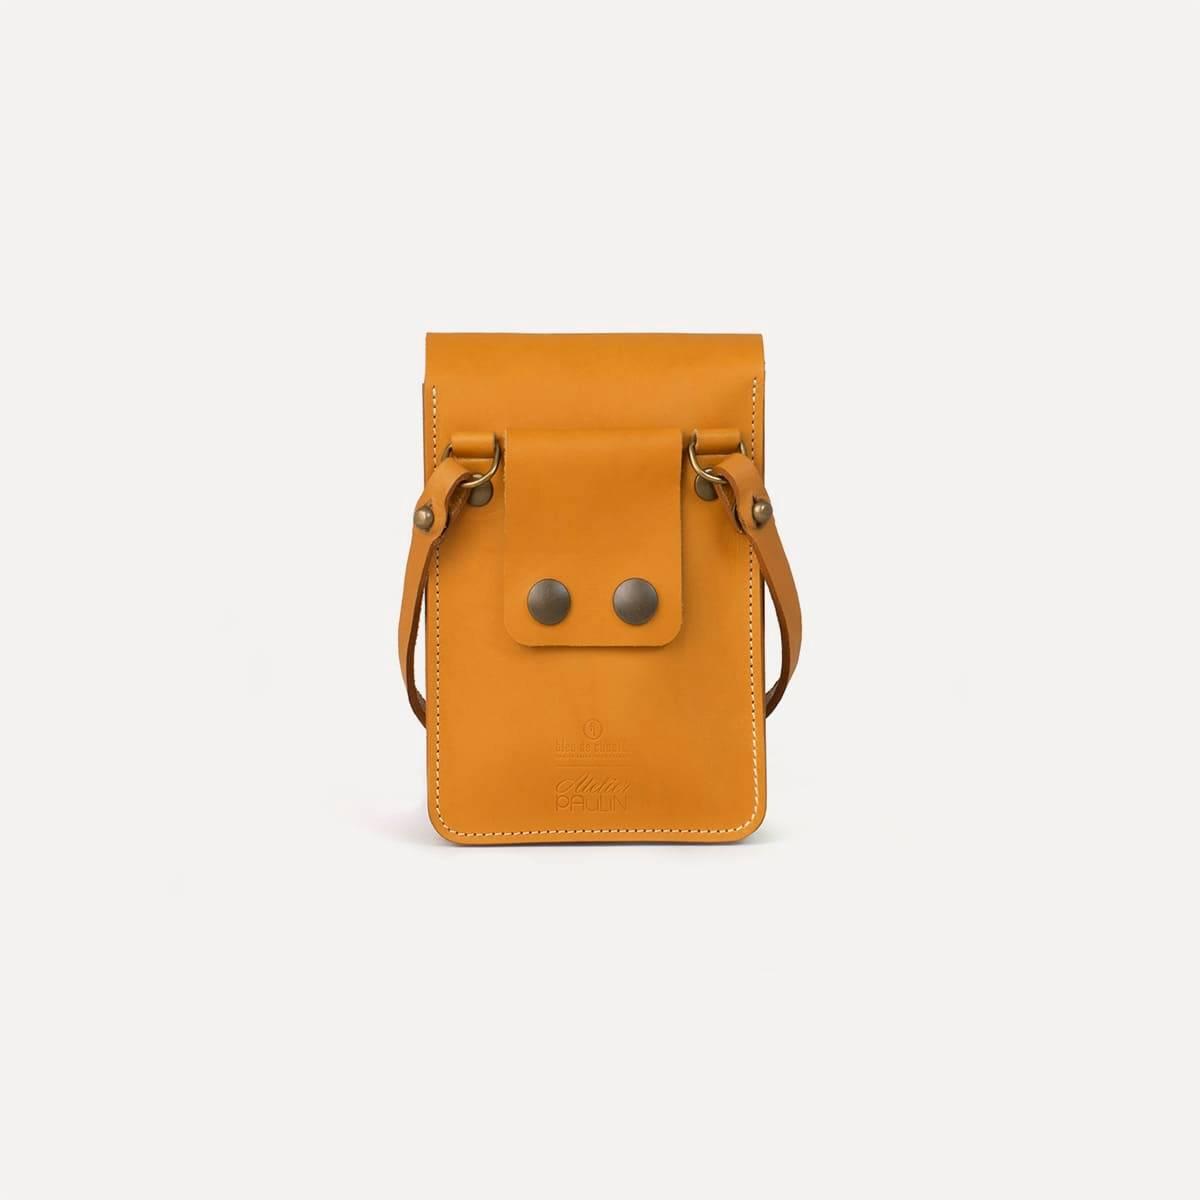 Jeweler's bag - BDC x Atelier Paulin (image n°5)